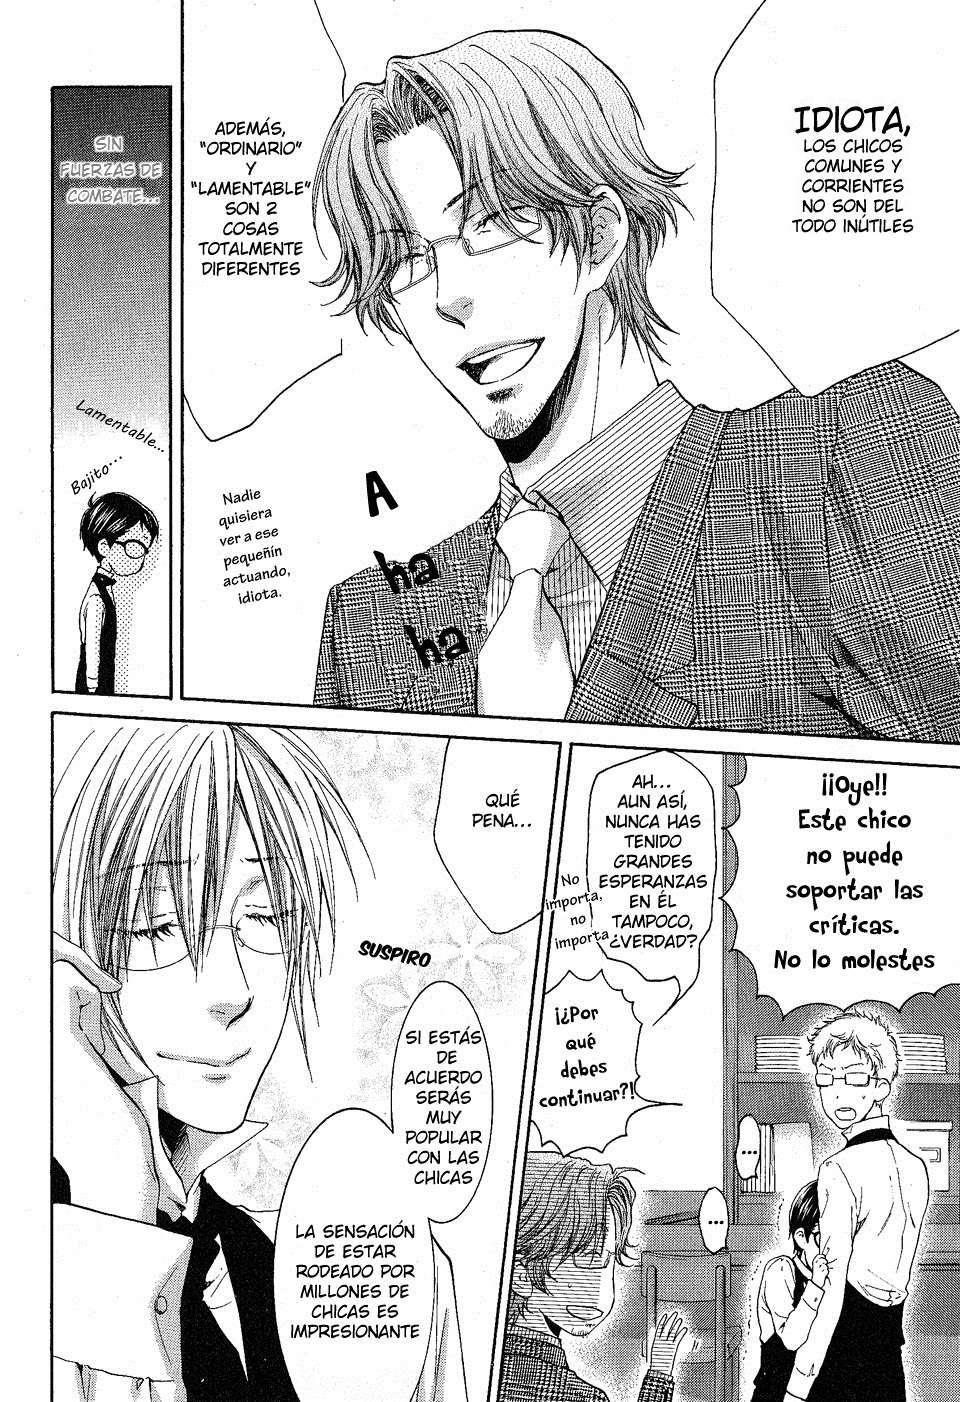 https://c5.ninemanga.com/es_manga/6/15814/378262/573f1f986cf0c7f66994e83d00eda692.jpg Page 42